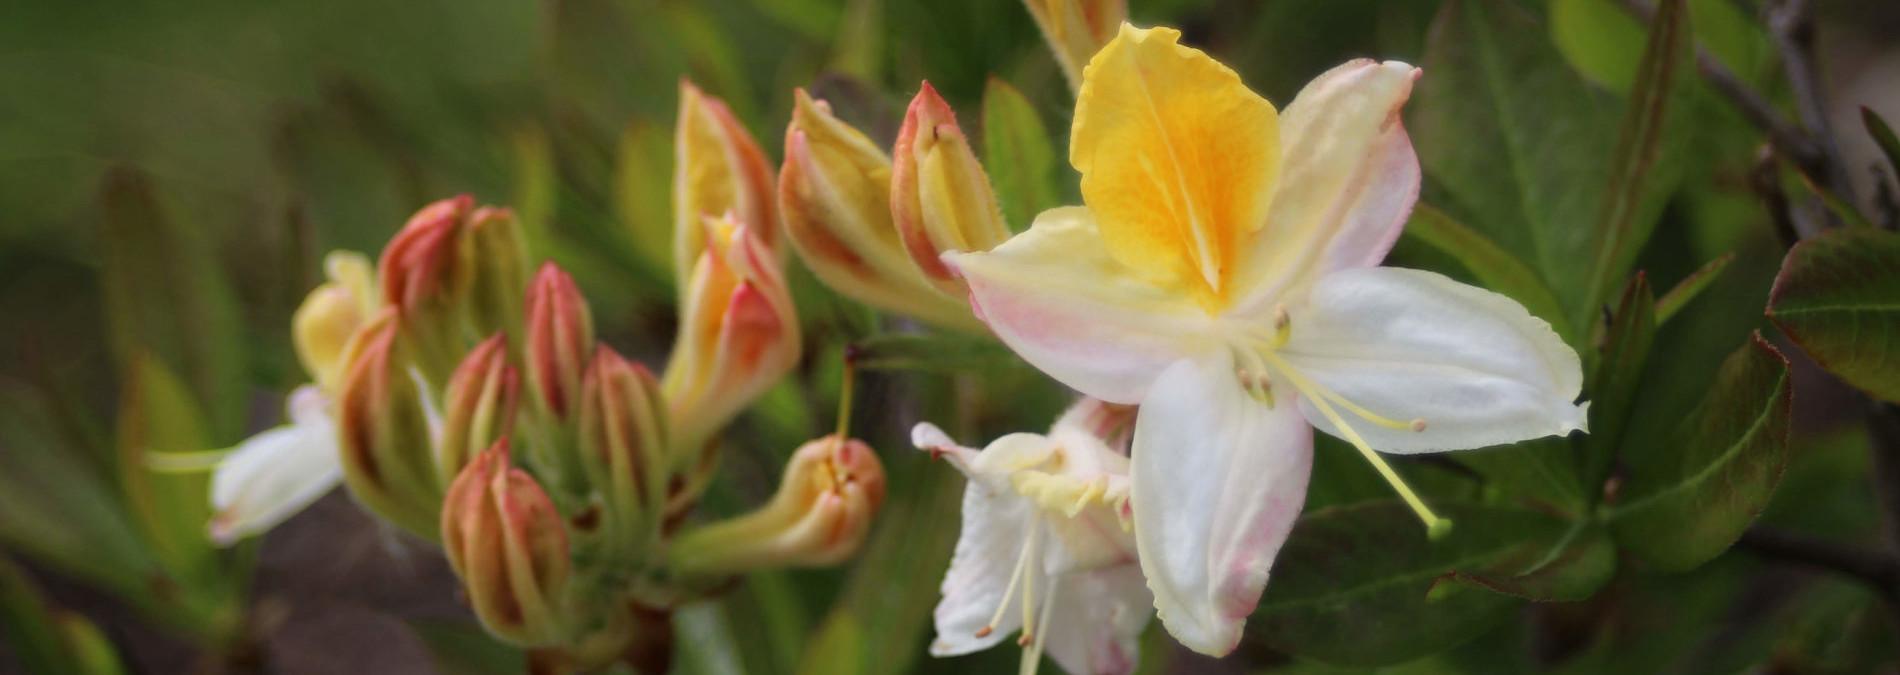 pheasant-gardens-03-675px